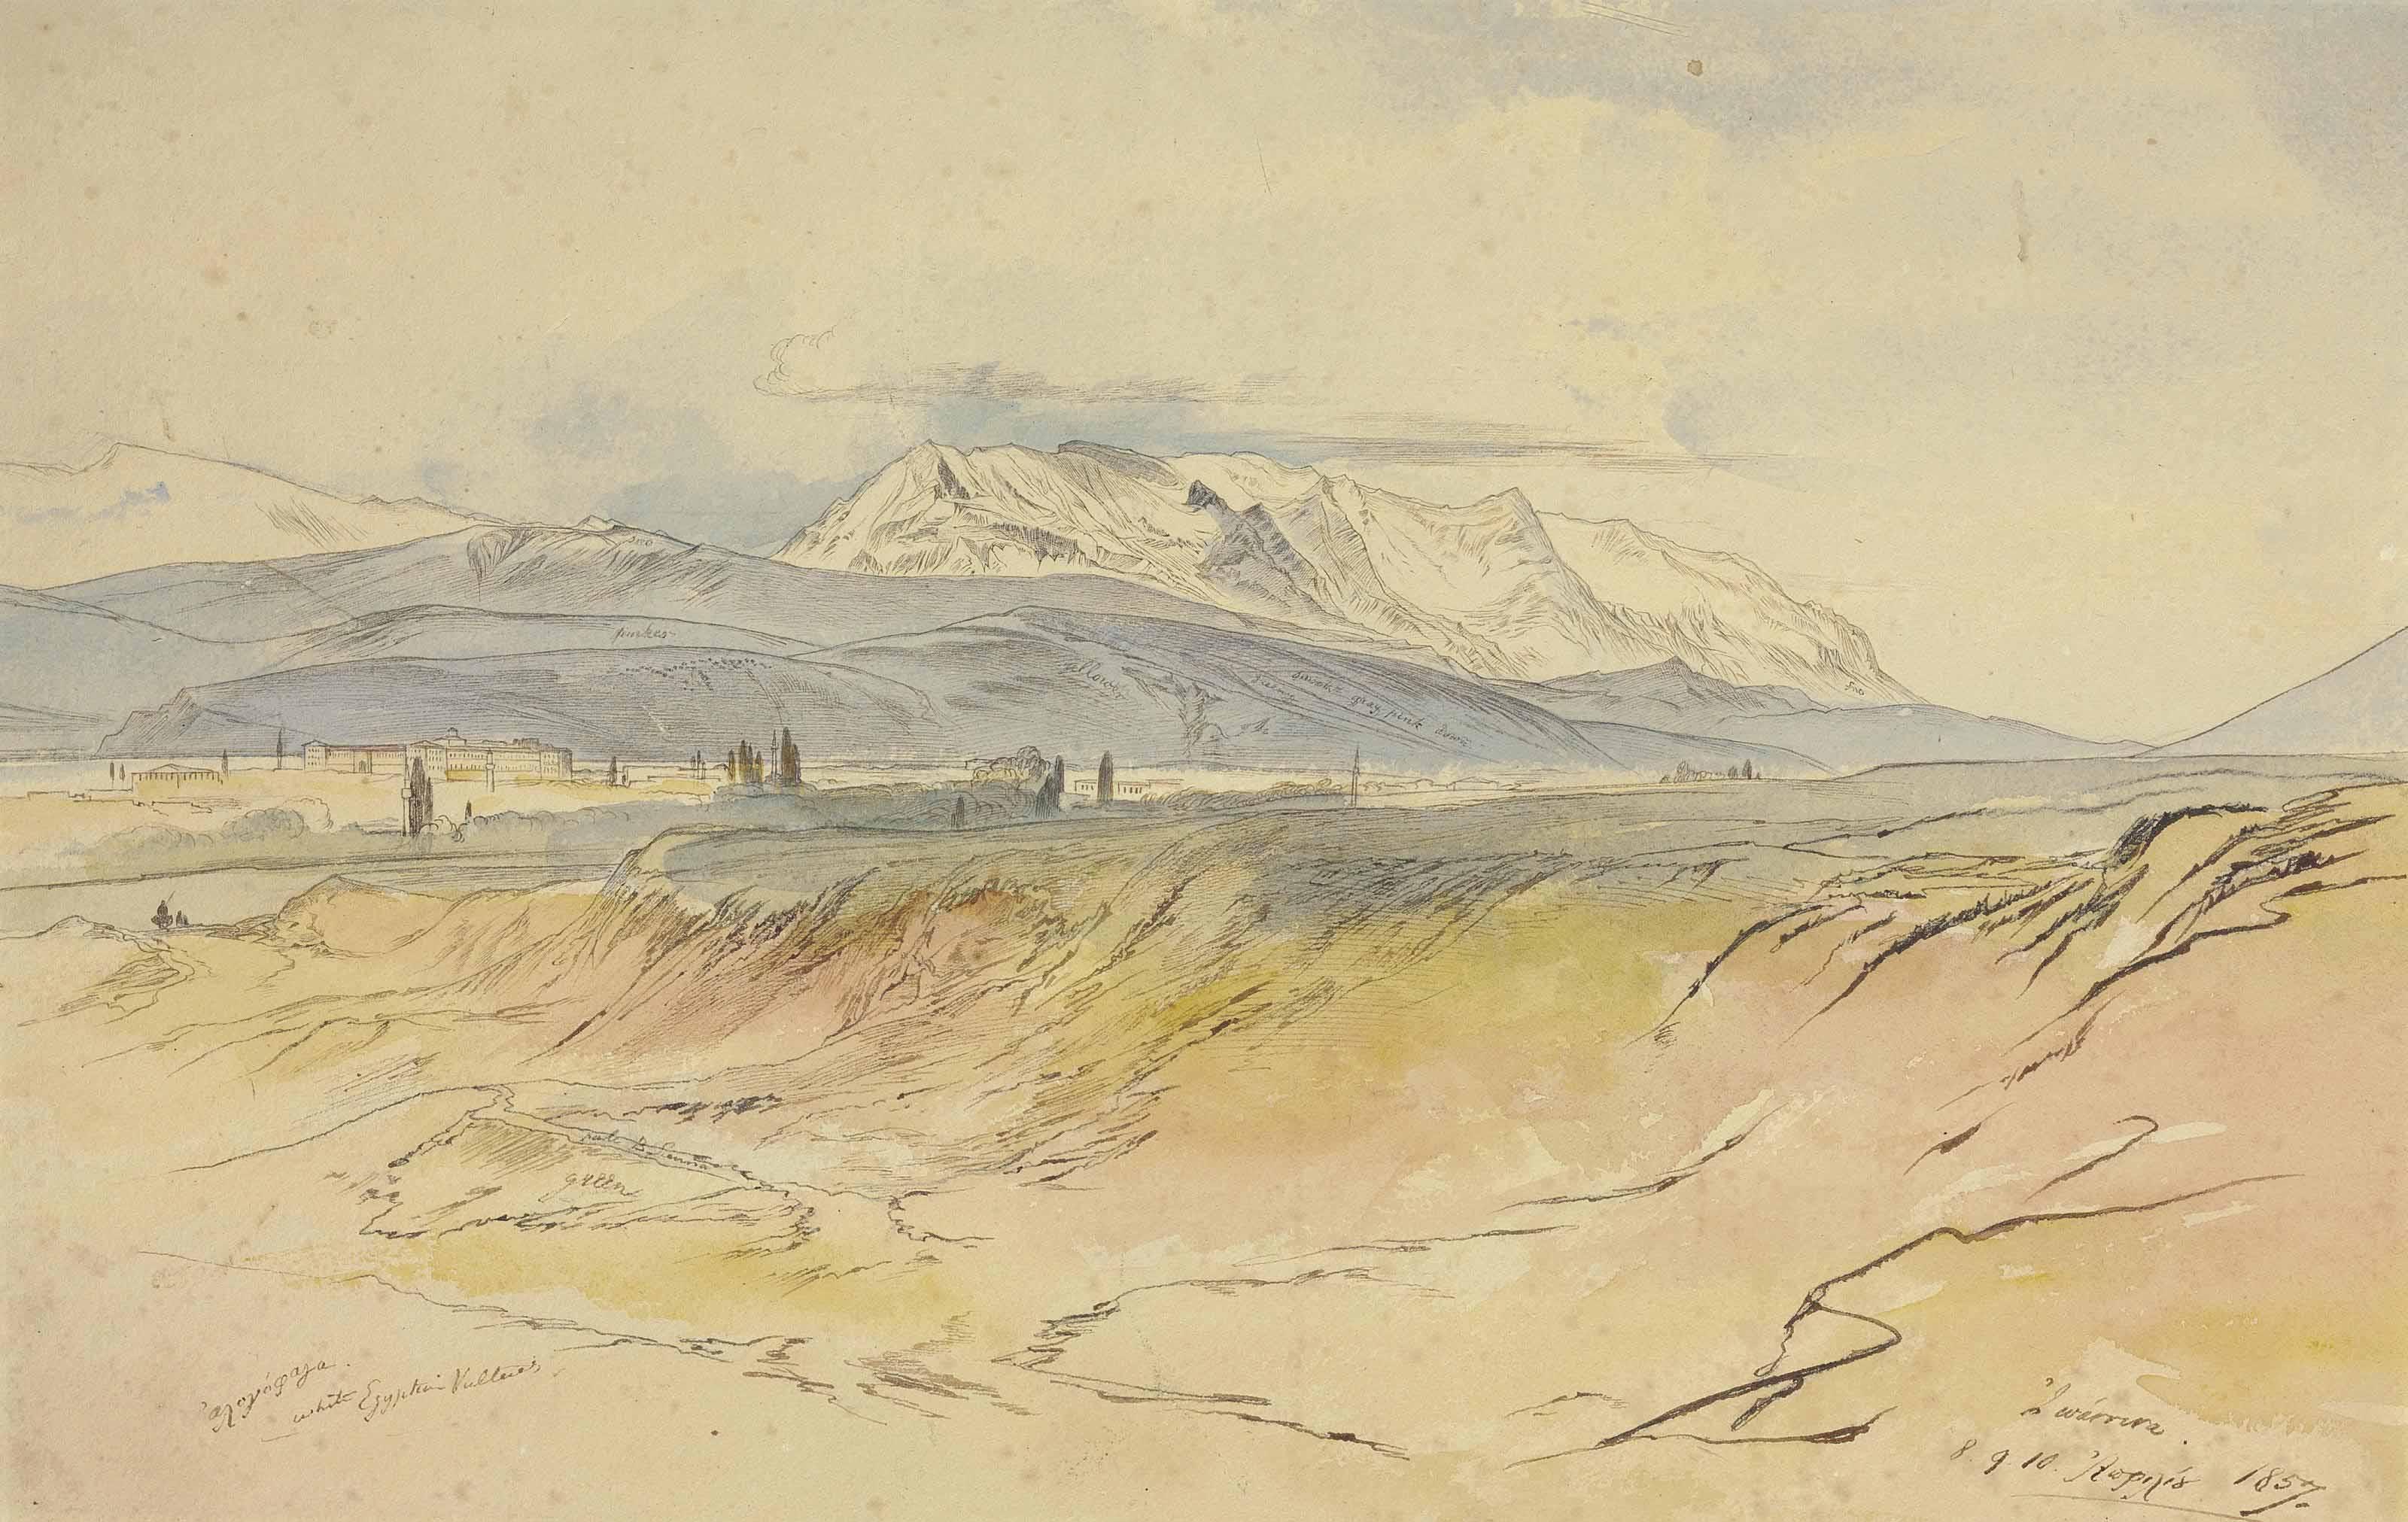 Edward Lear (London 1812-1888 San Remo, Italy)